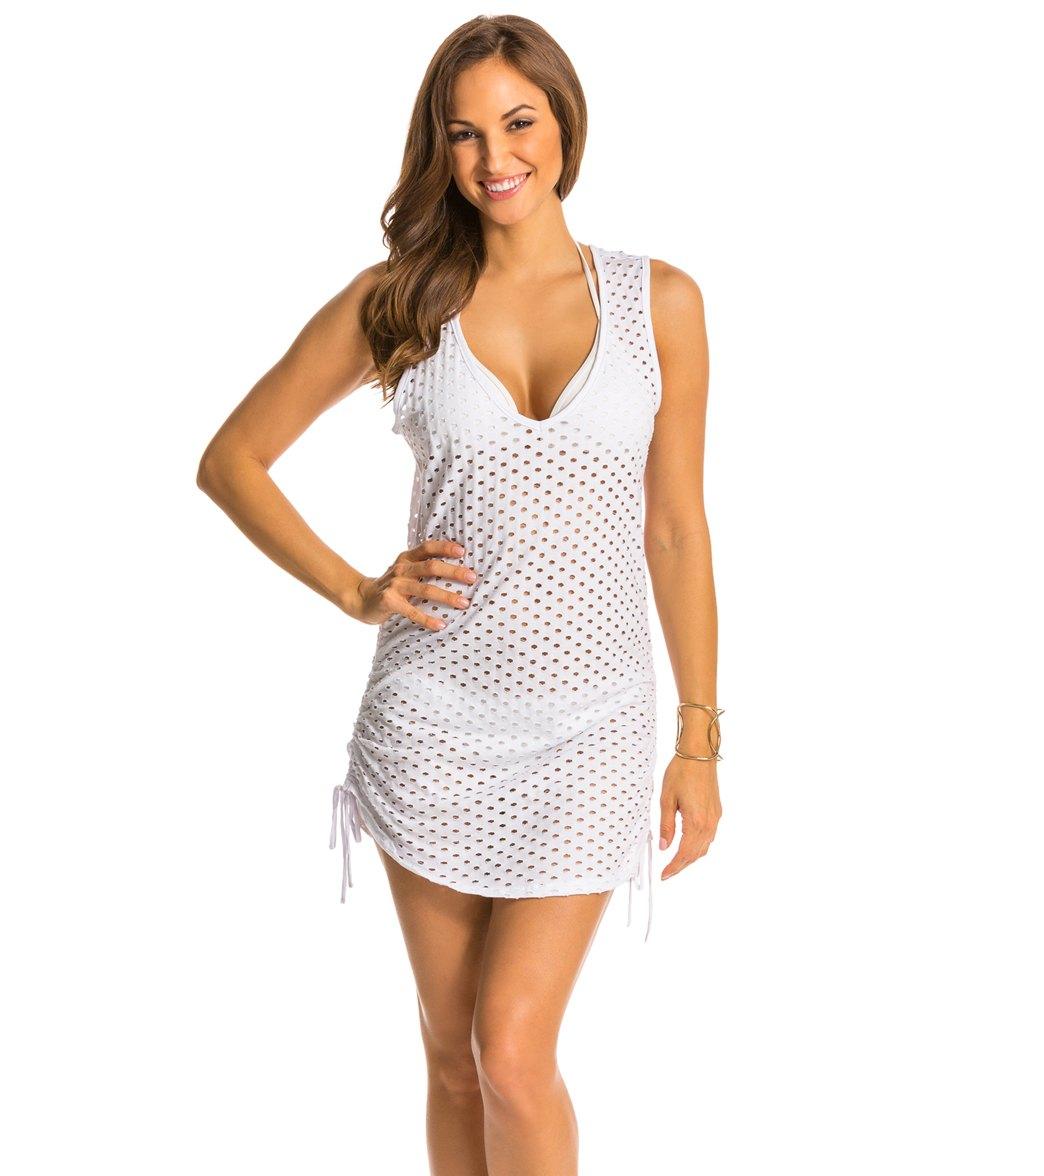 256b8f1f25 ... Eco Swim Organic Solid Jacquard Side Shirred Cover Up Dress. Play  Video. MODEL MEASUREMENTS